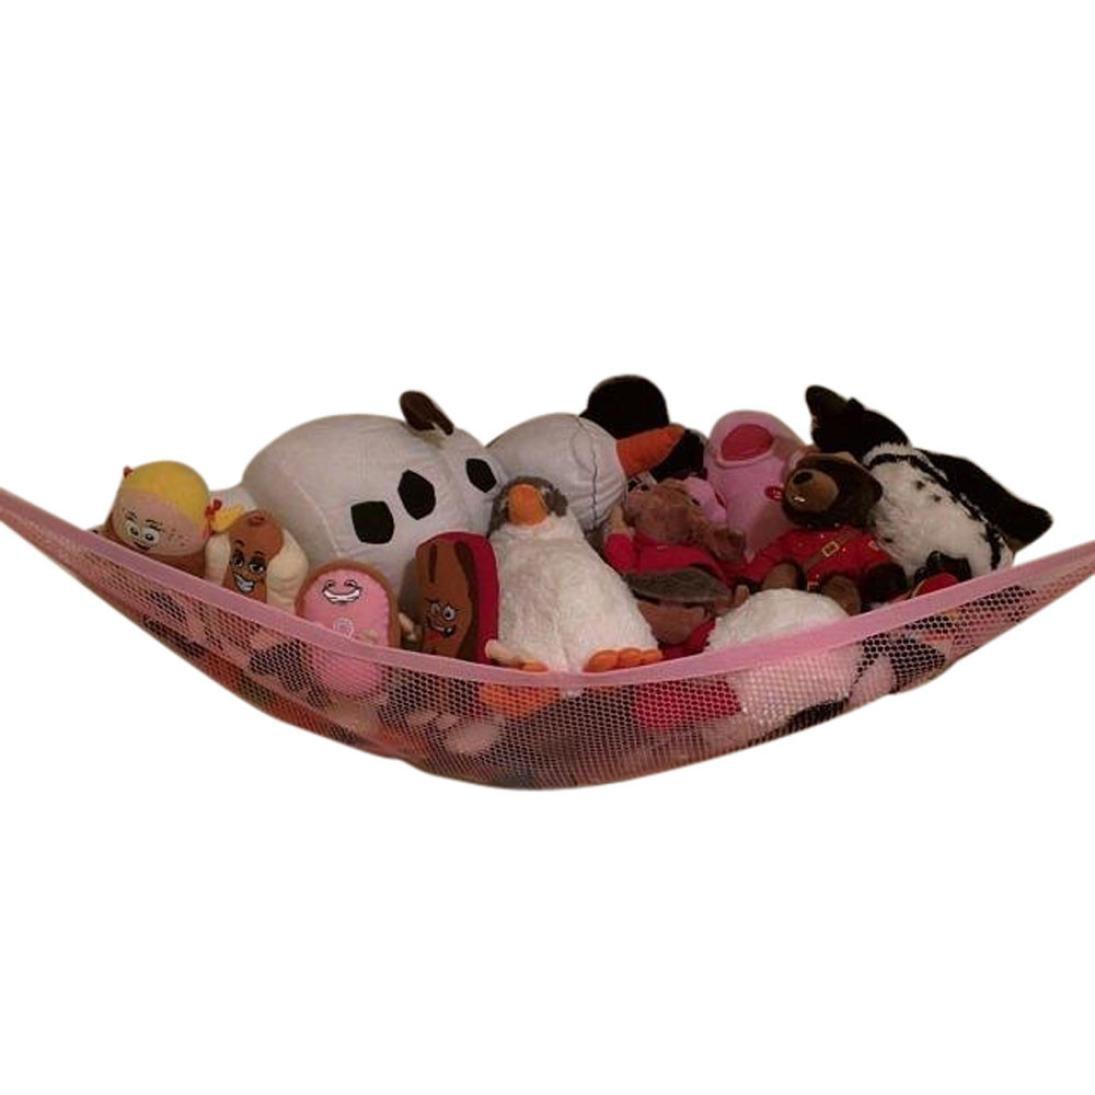 Bescita Toy Hammocks, Jumbo Toy Hammock Corner Toy Hammock Cuddly Toy Storage Hammock Net Organiser   Size: 32' x 24' x 24' for Cuddly Toys, Stuffed Animals, Teddies, Soft Toys (White)